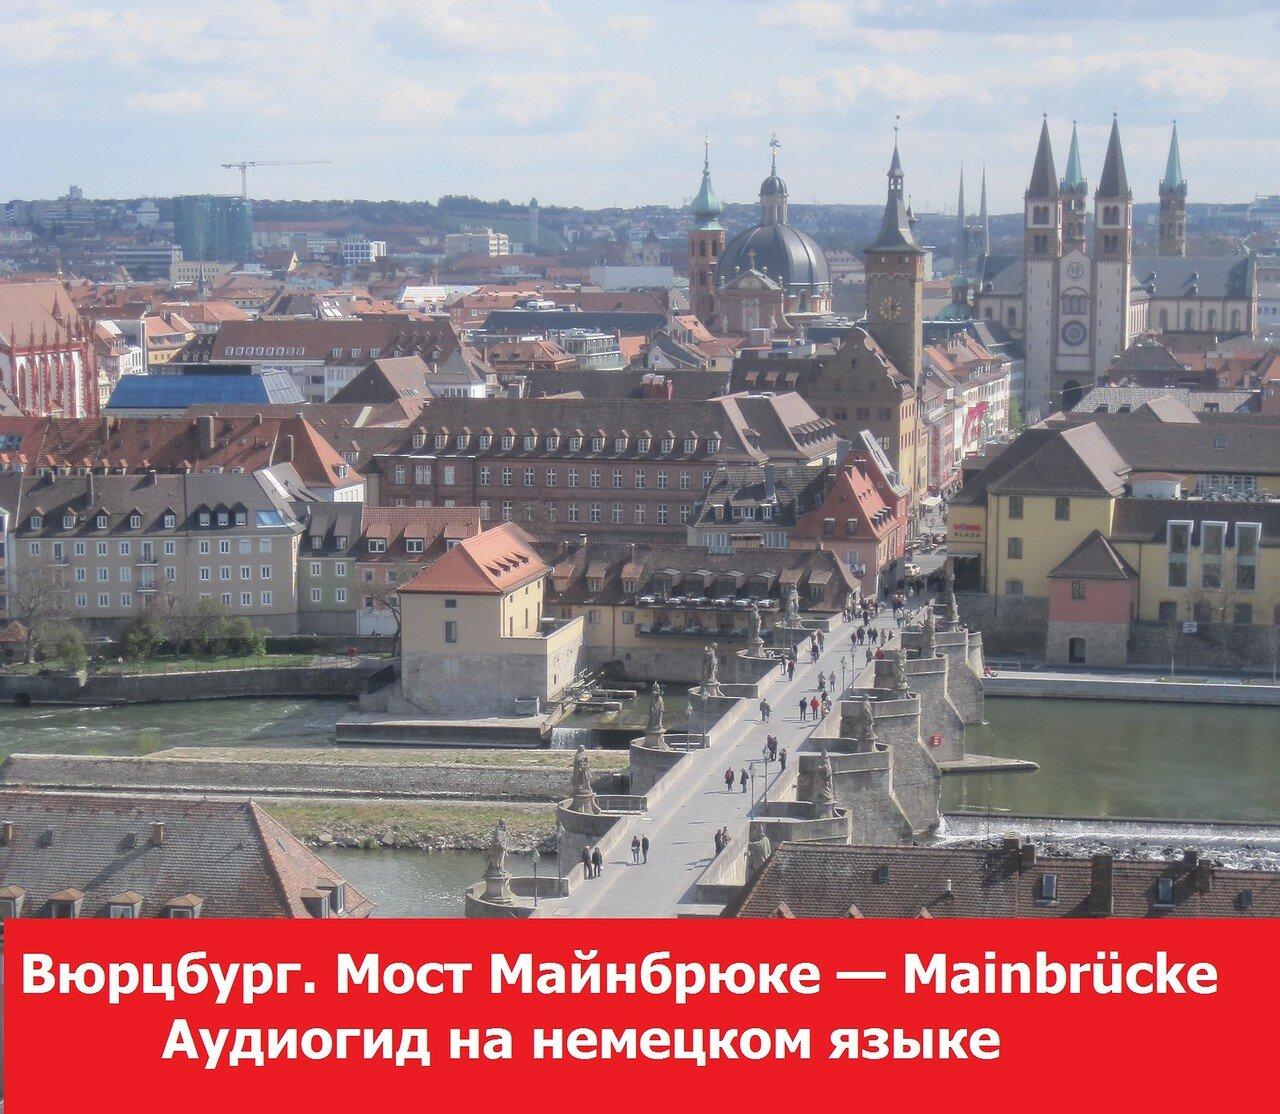 Вюрцбург. Мост Майнбрюке — Mainbrücke. Аудиогид на немецком языке